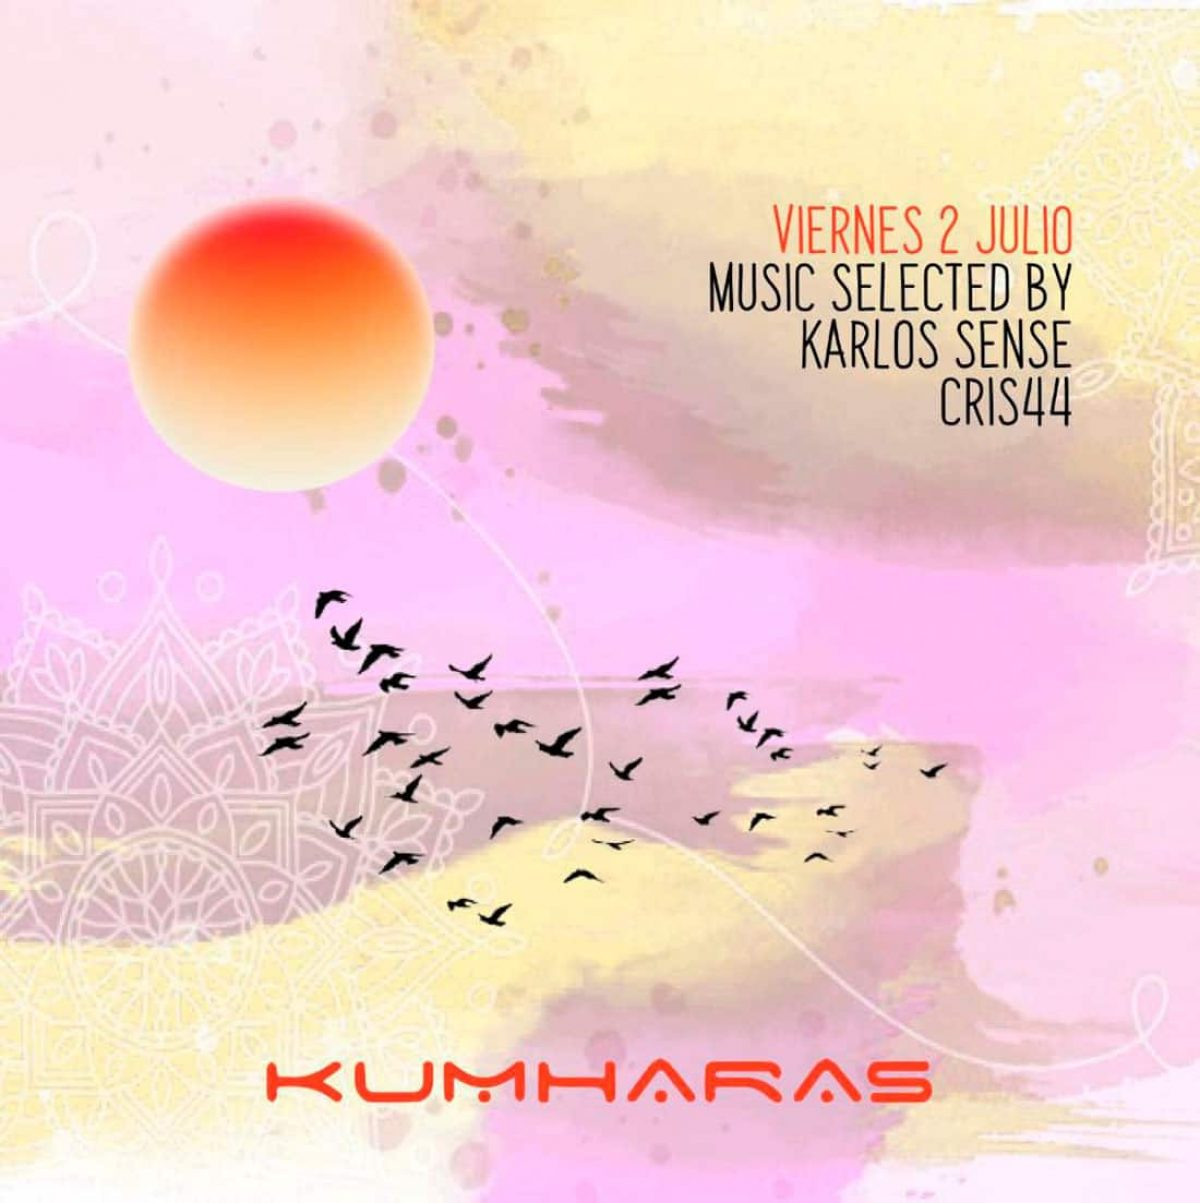 kumharas-ibiza-karlos-sense-cris44-2021-welcometoibiza